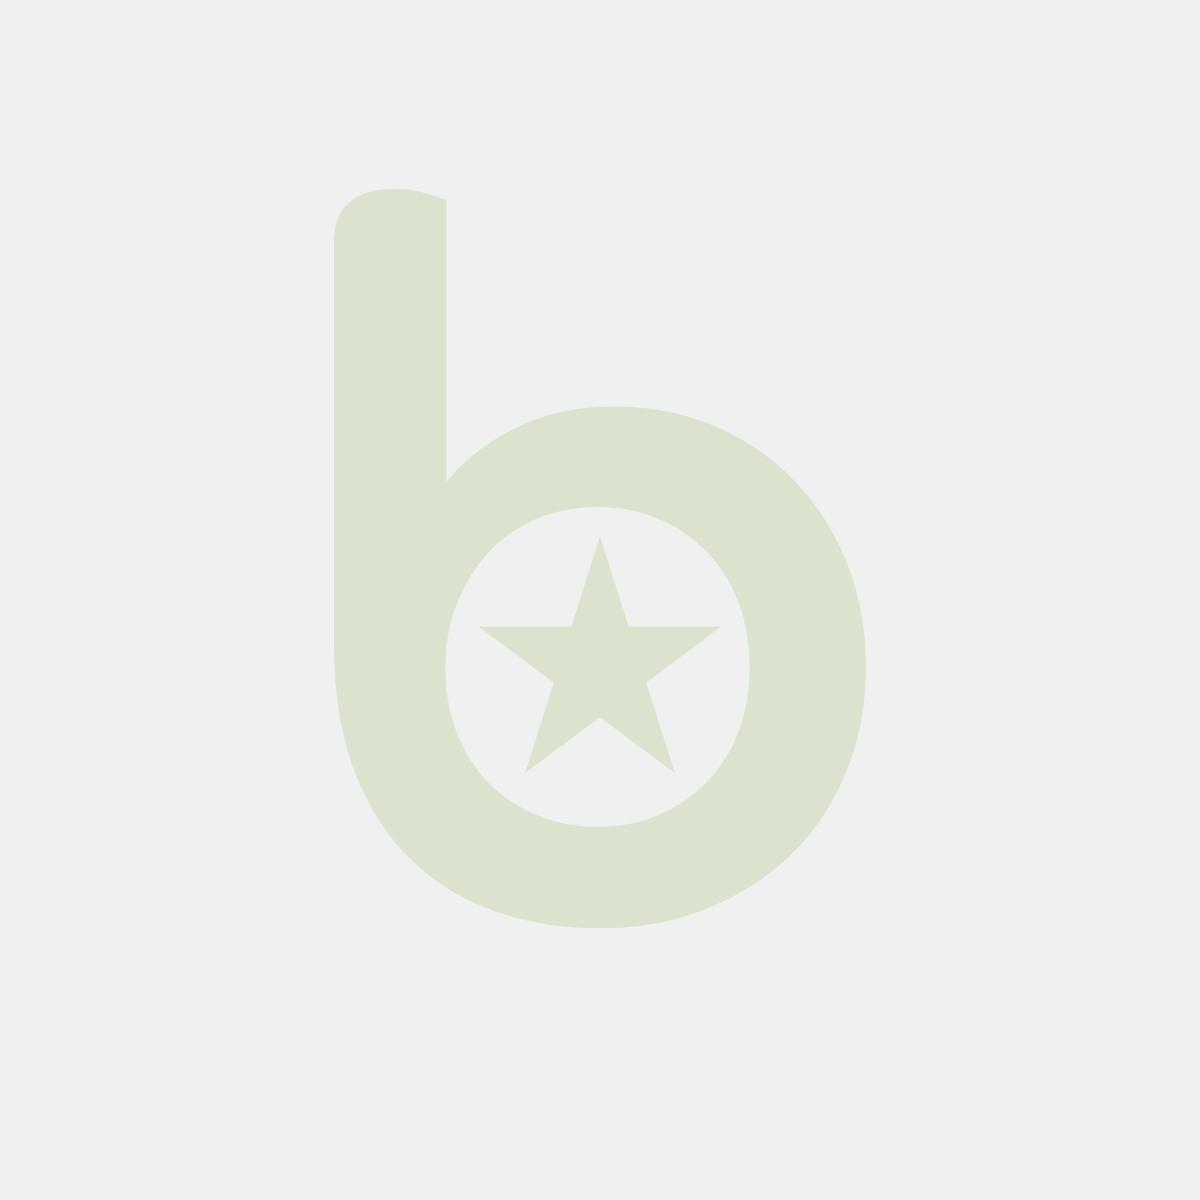 Sosjerka 22x7x4,5 biała z melaminy